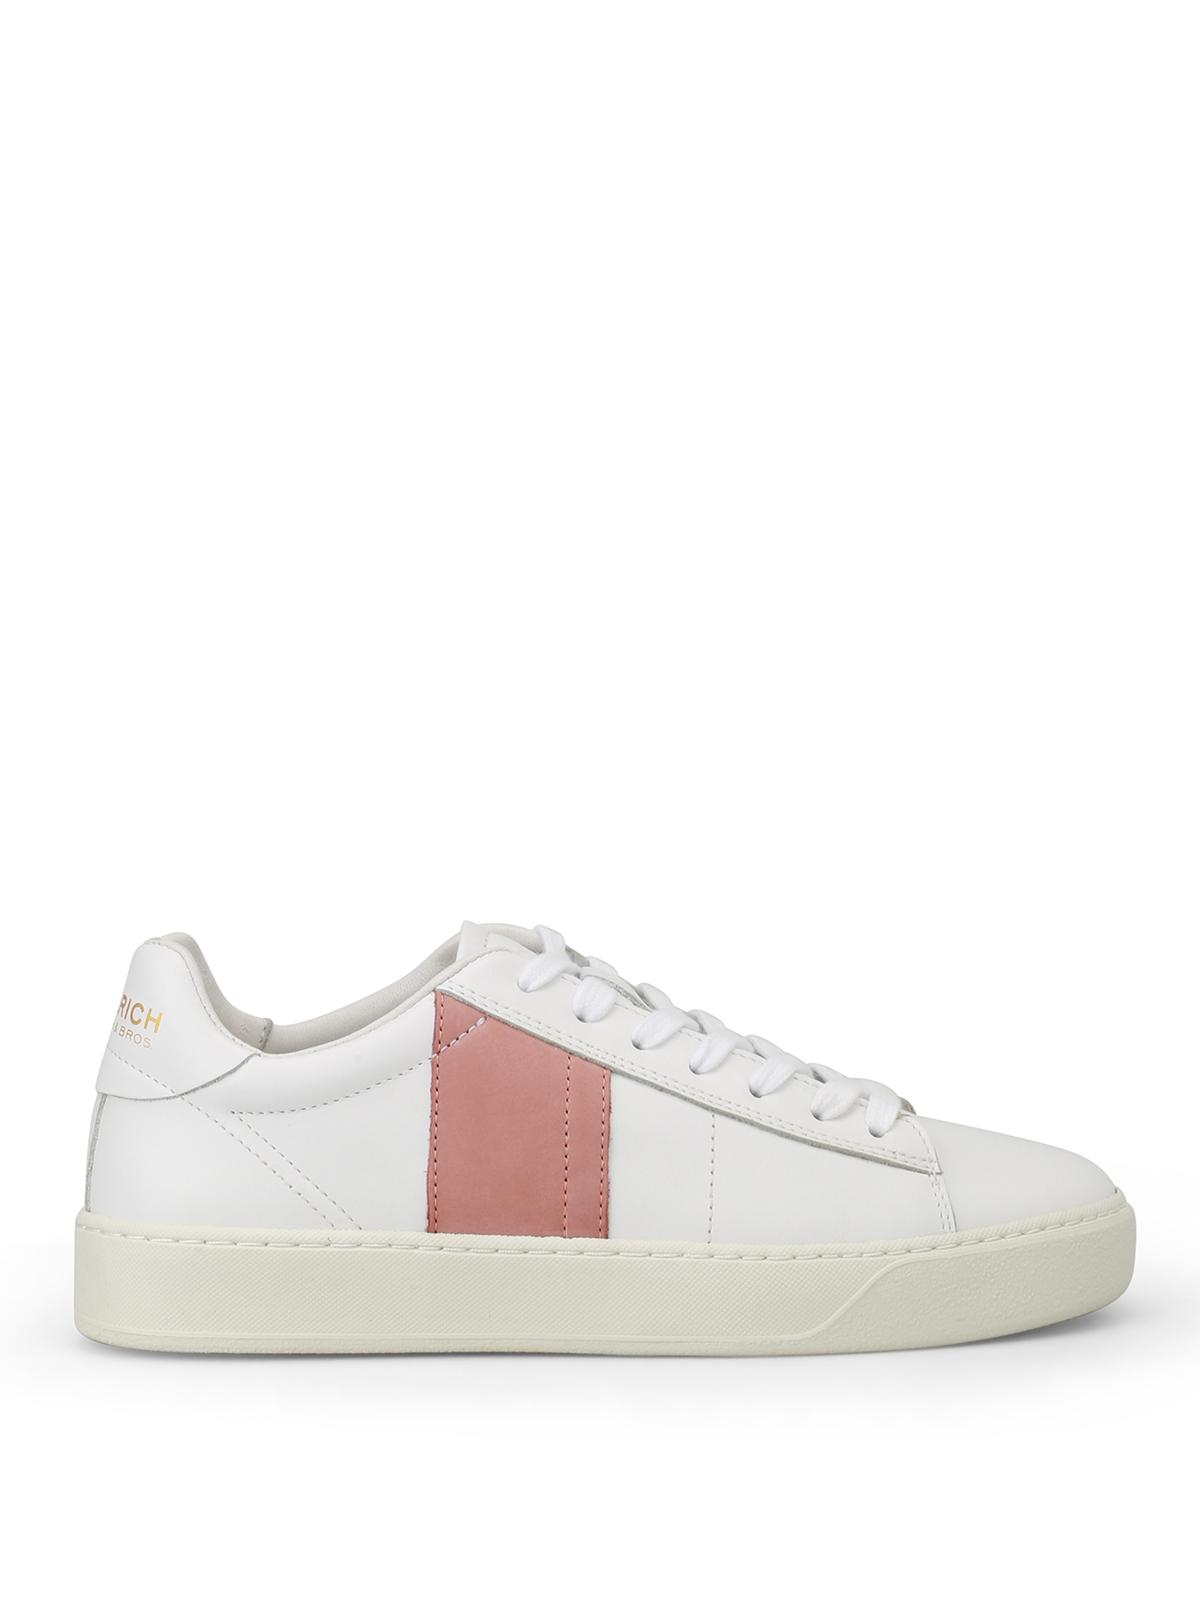 Shop Wf2130 420Ikrix Online Woolrich Sneaker Weiß 0wPk8nO